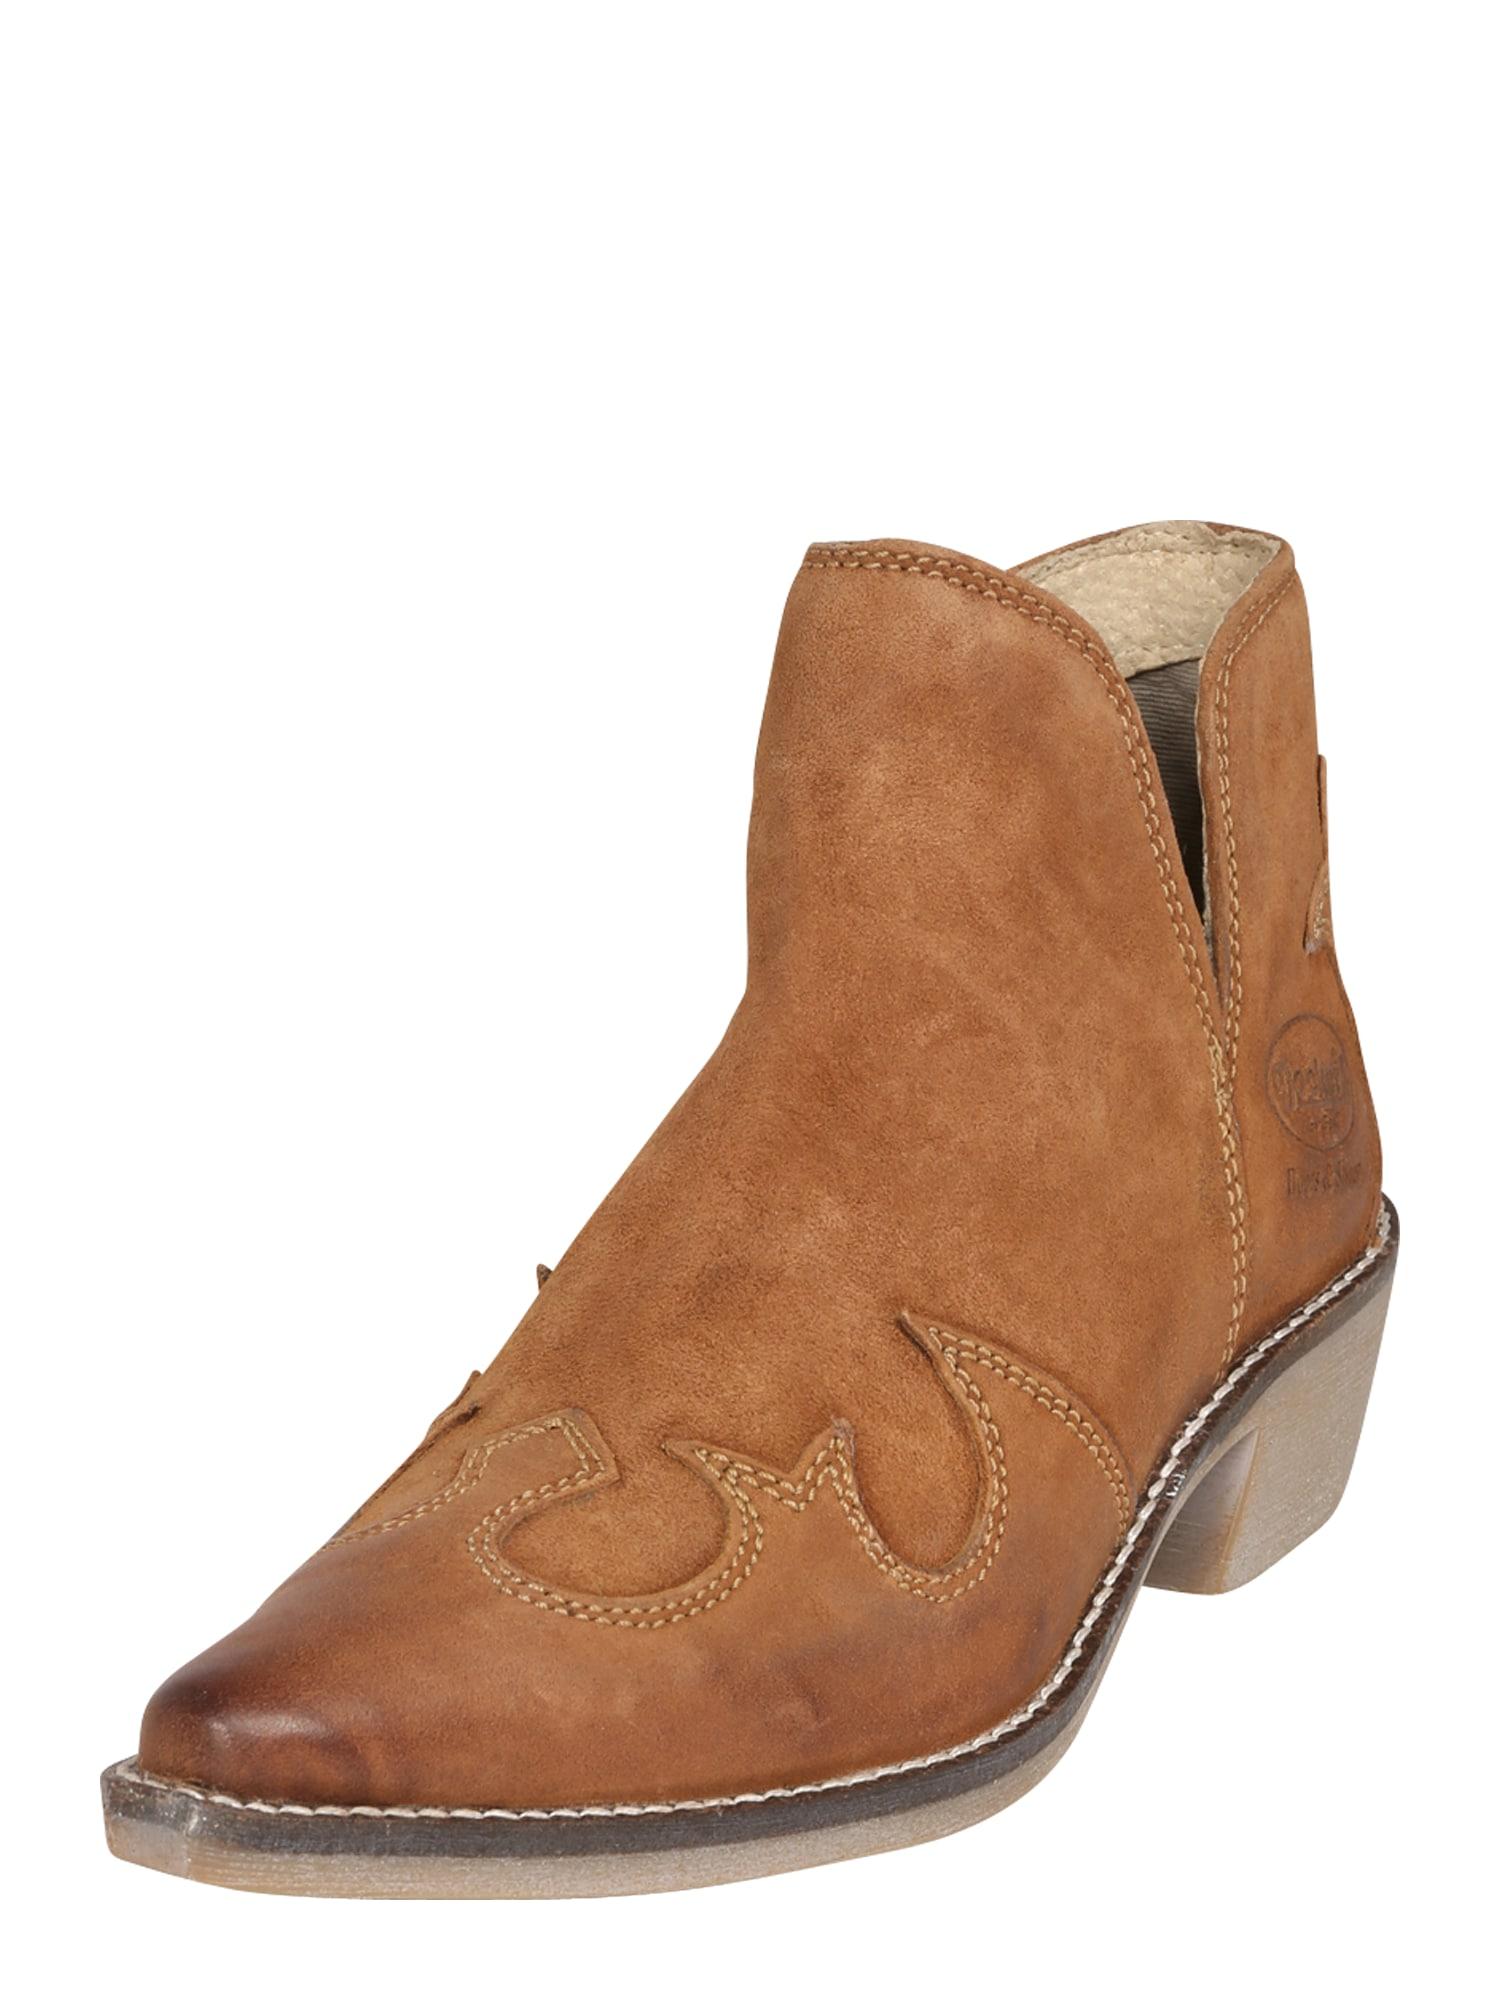 Dockers by Gerli Kulkšnis dengiantys batai ruda